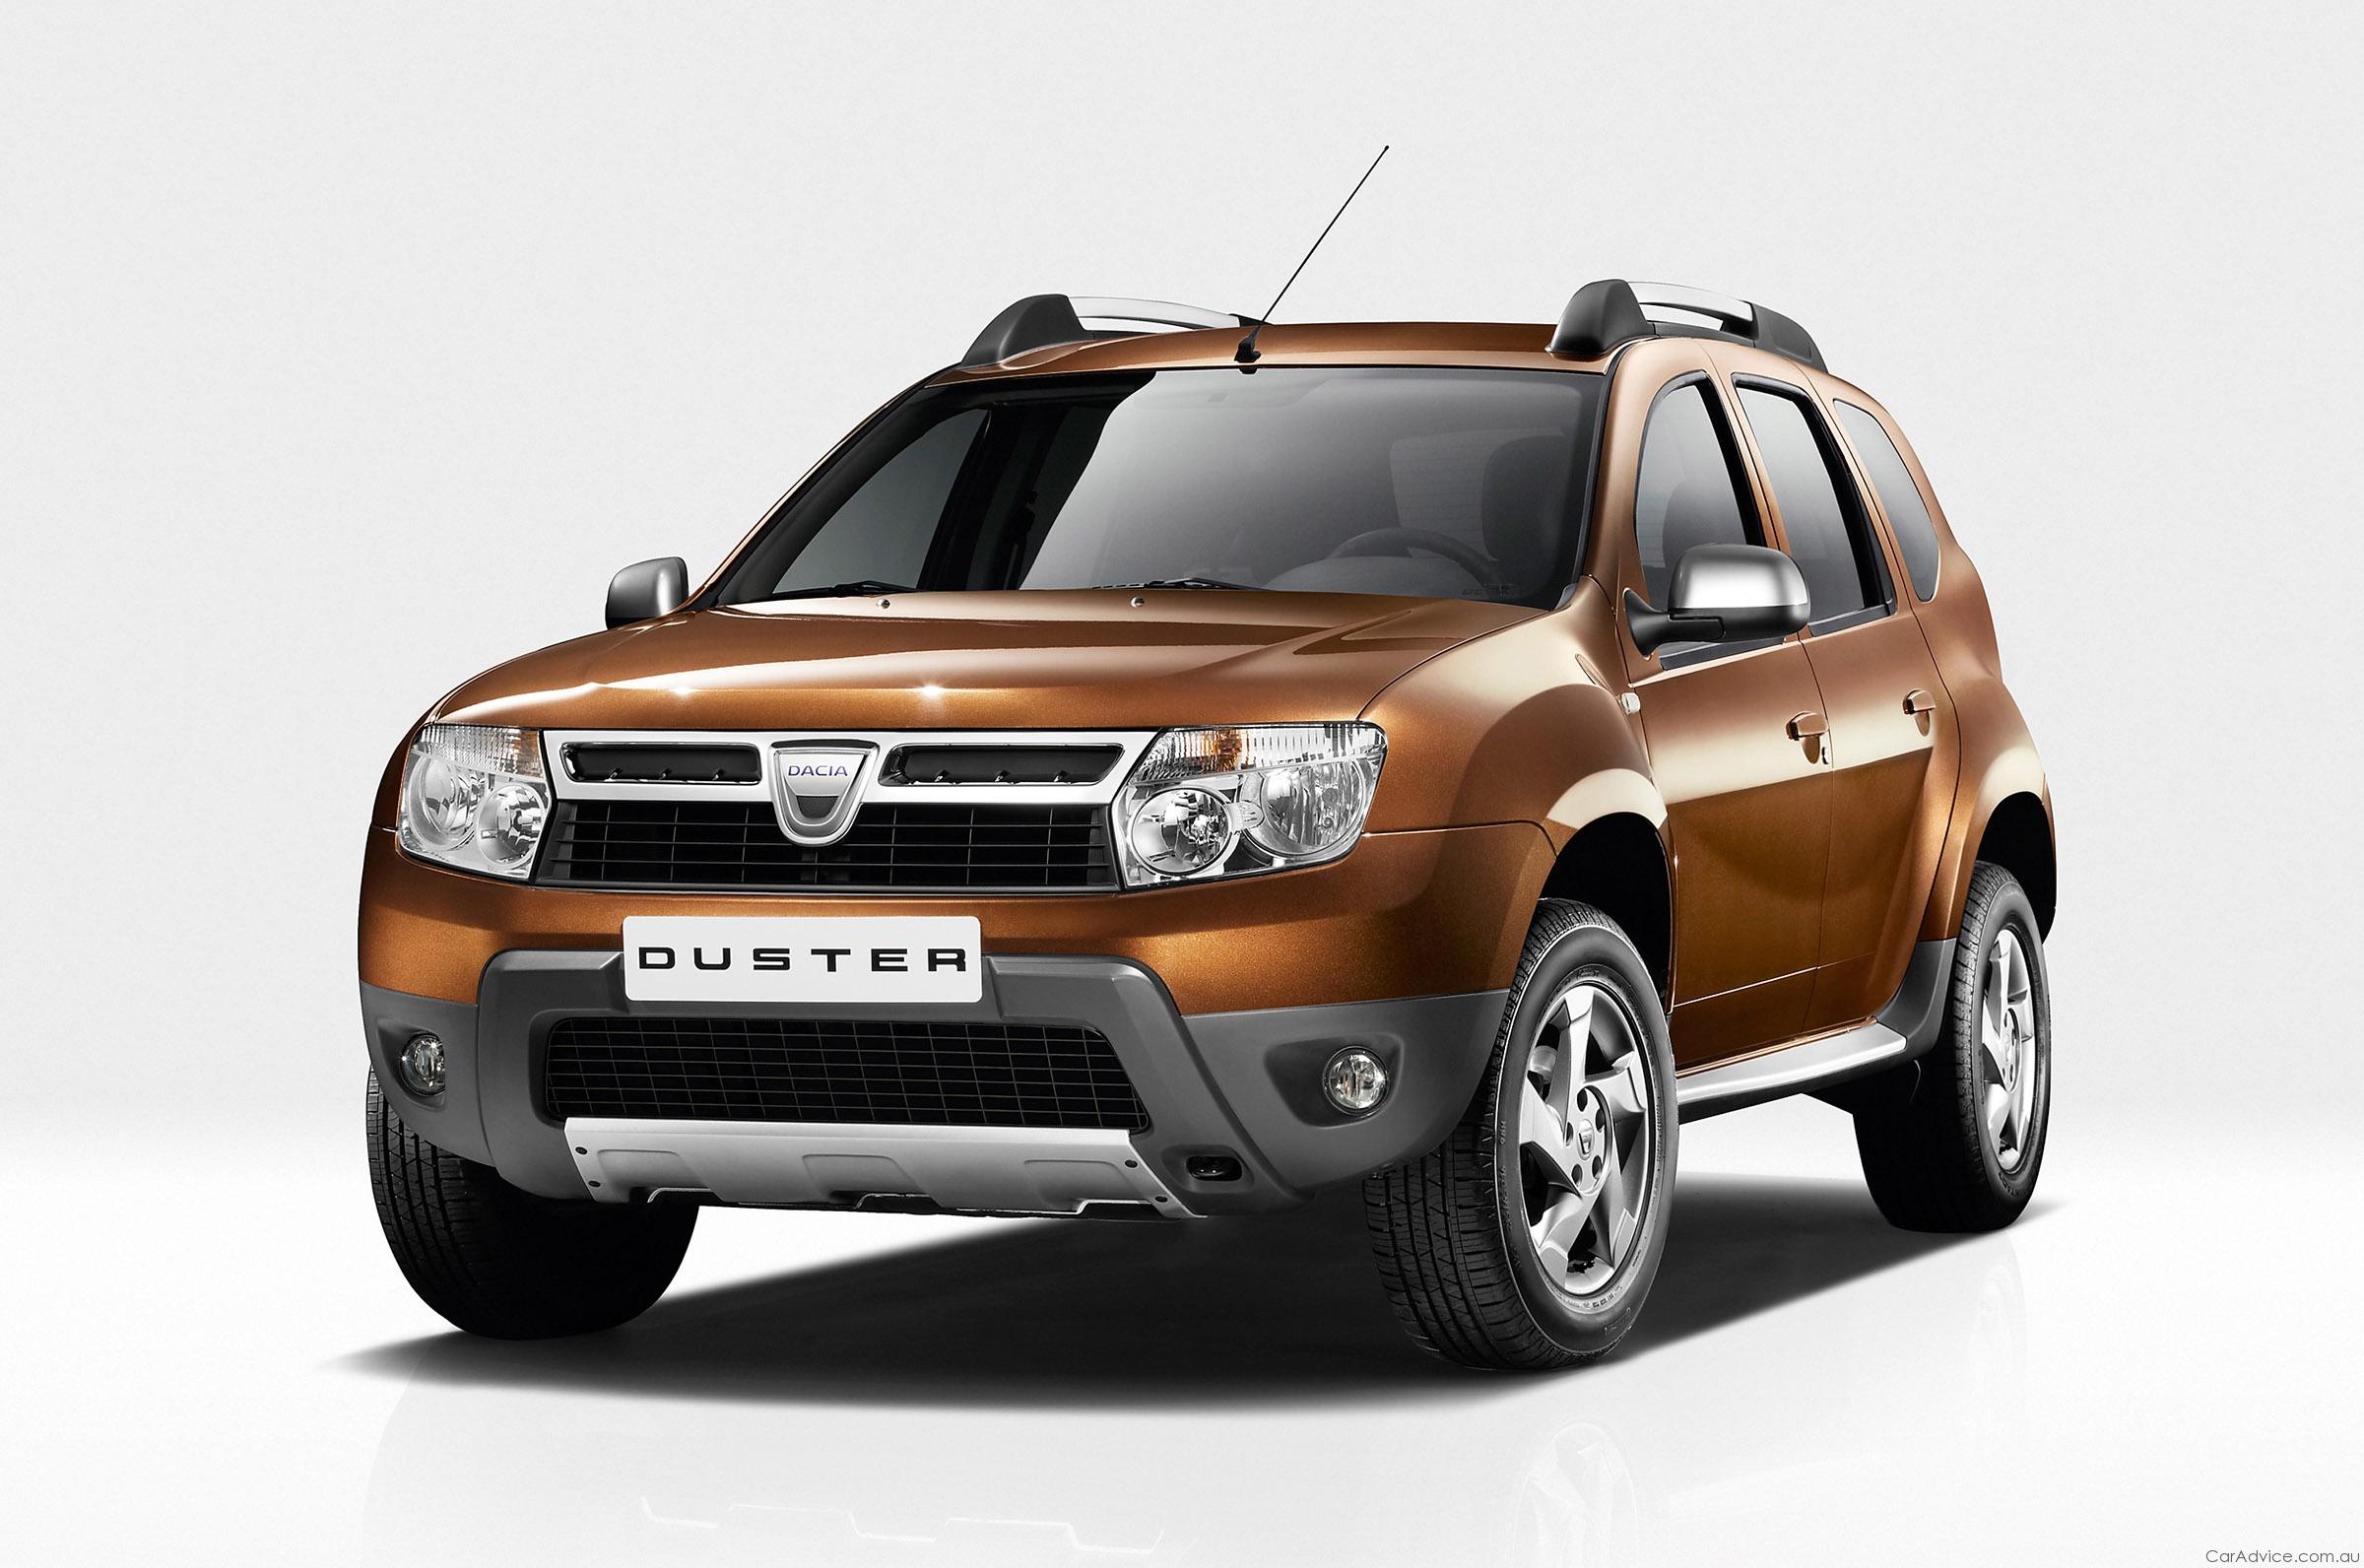 2017 dacia duster next generation review future auto review - Dacia Duster Revealed At Geneva Motor Show